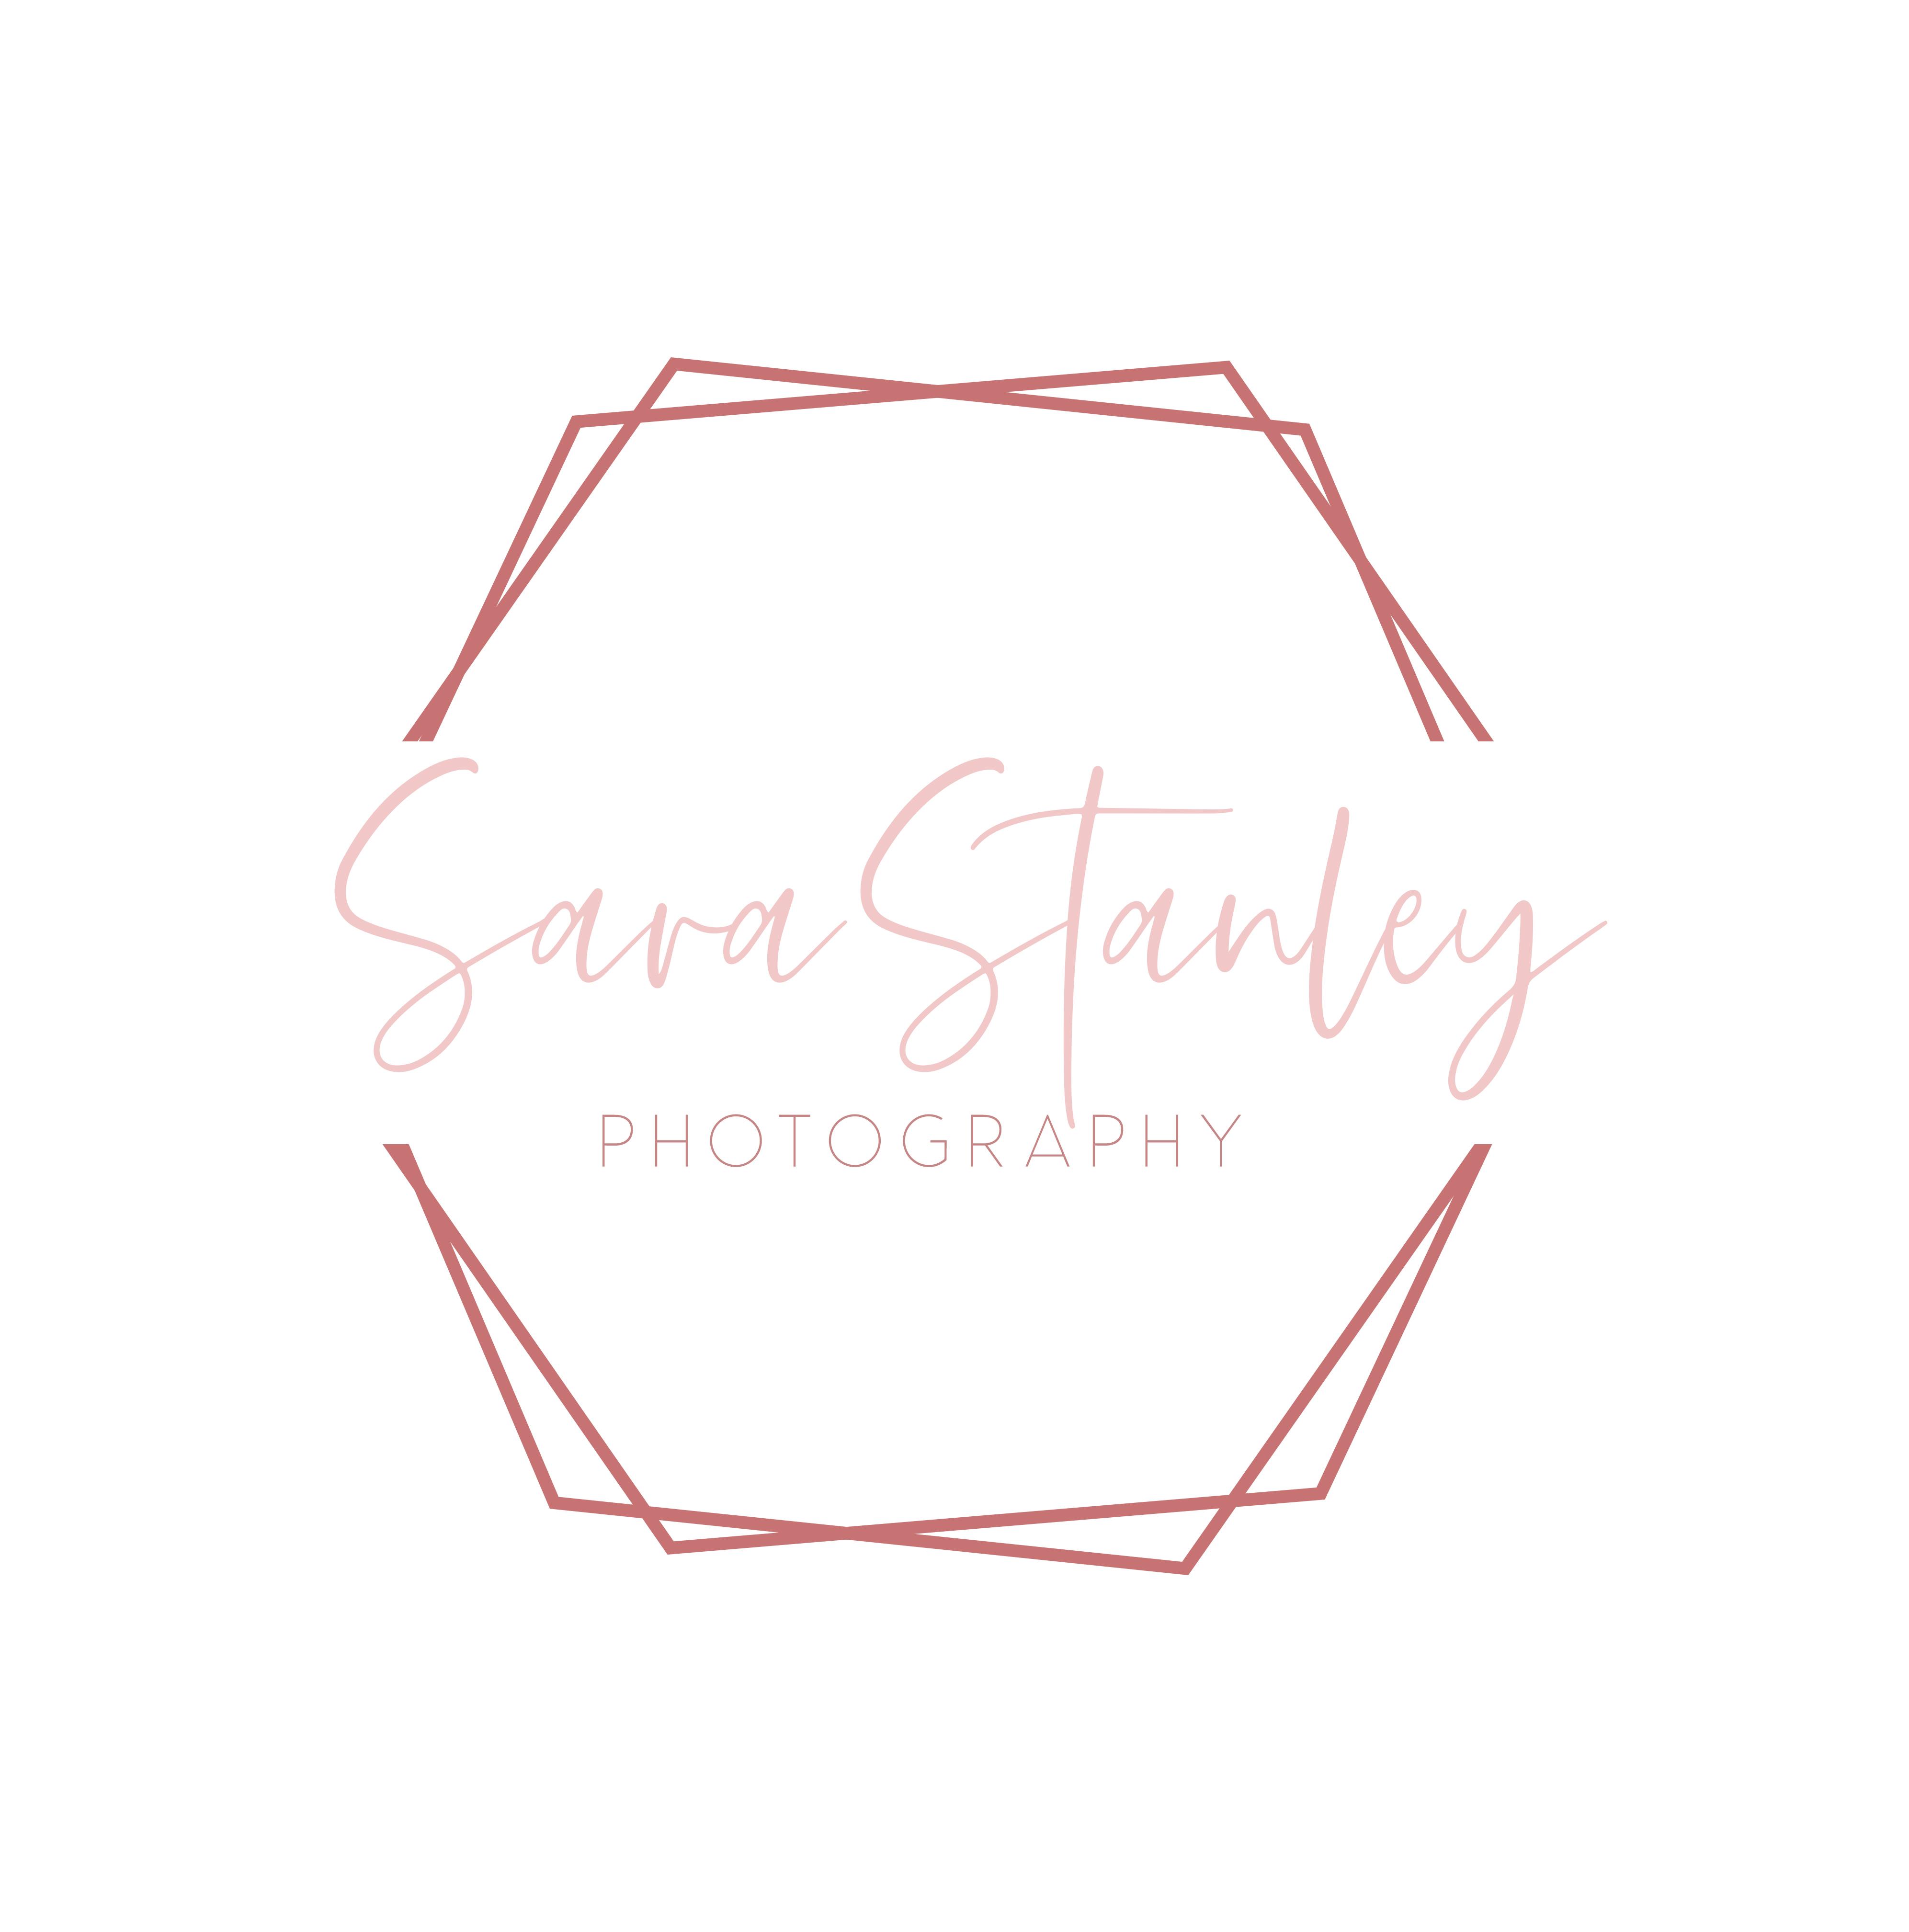 Sara Stanley Photography